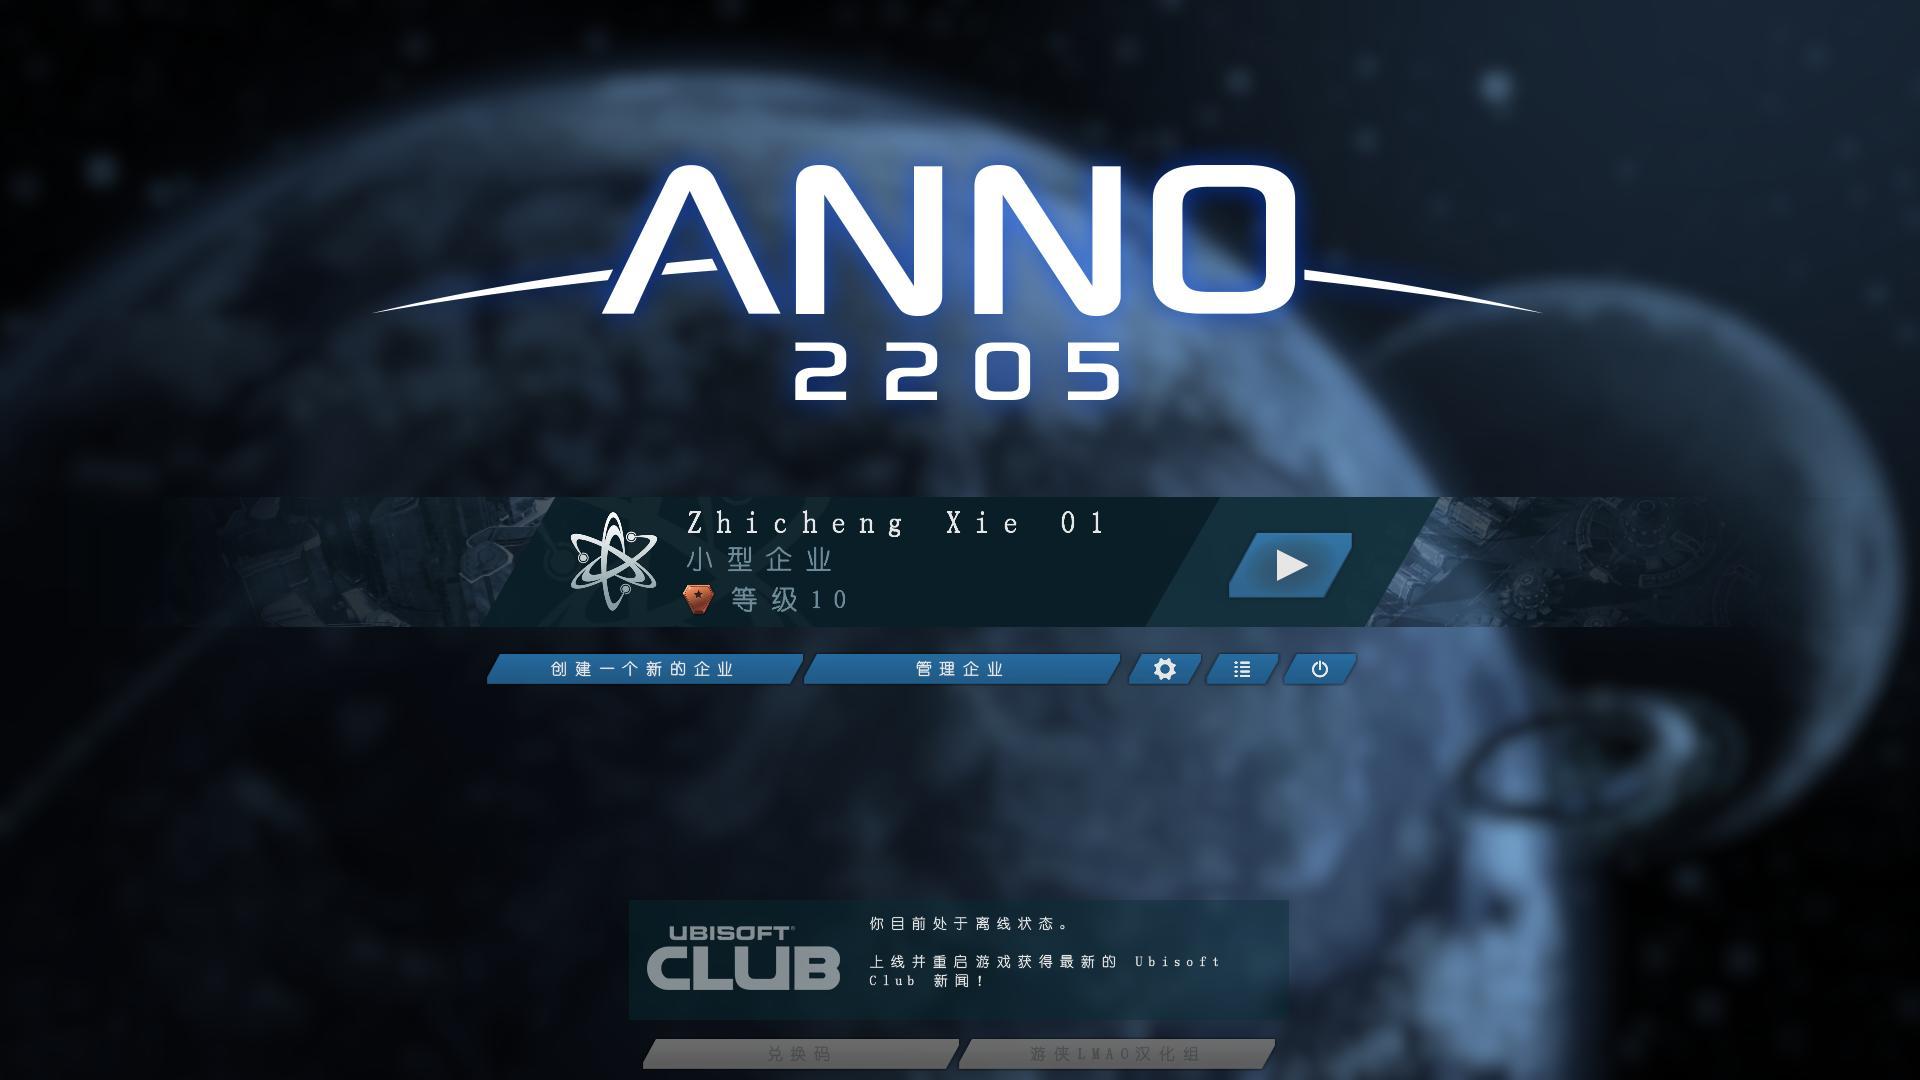 Anno2205 2015-12-17 15-49-35-26.jpg